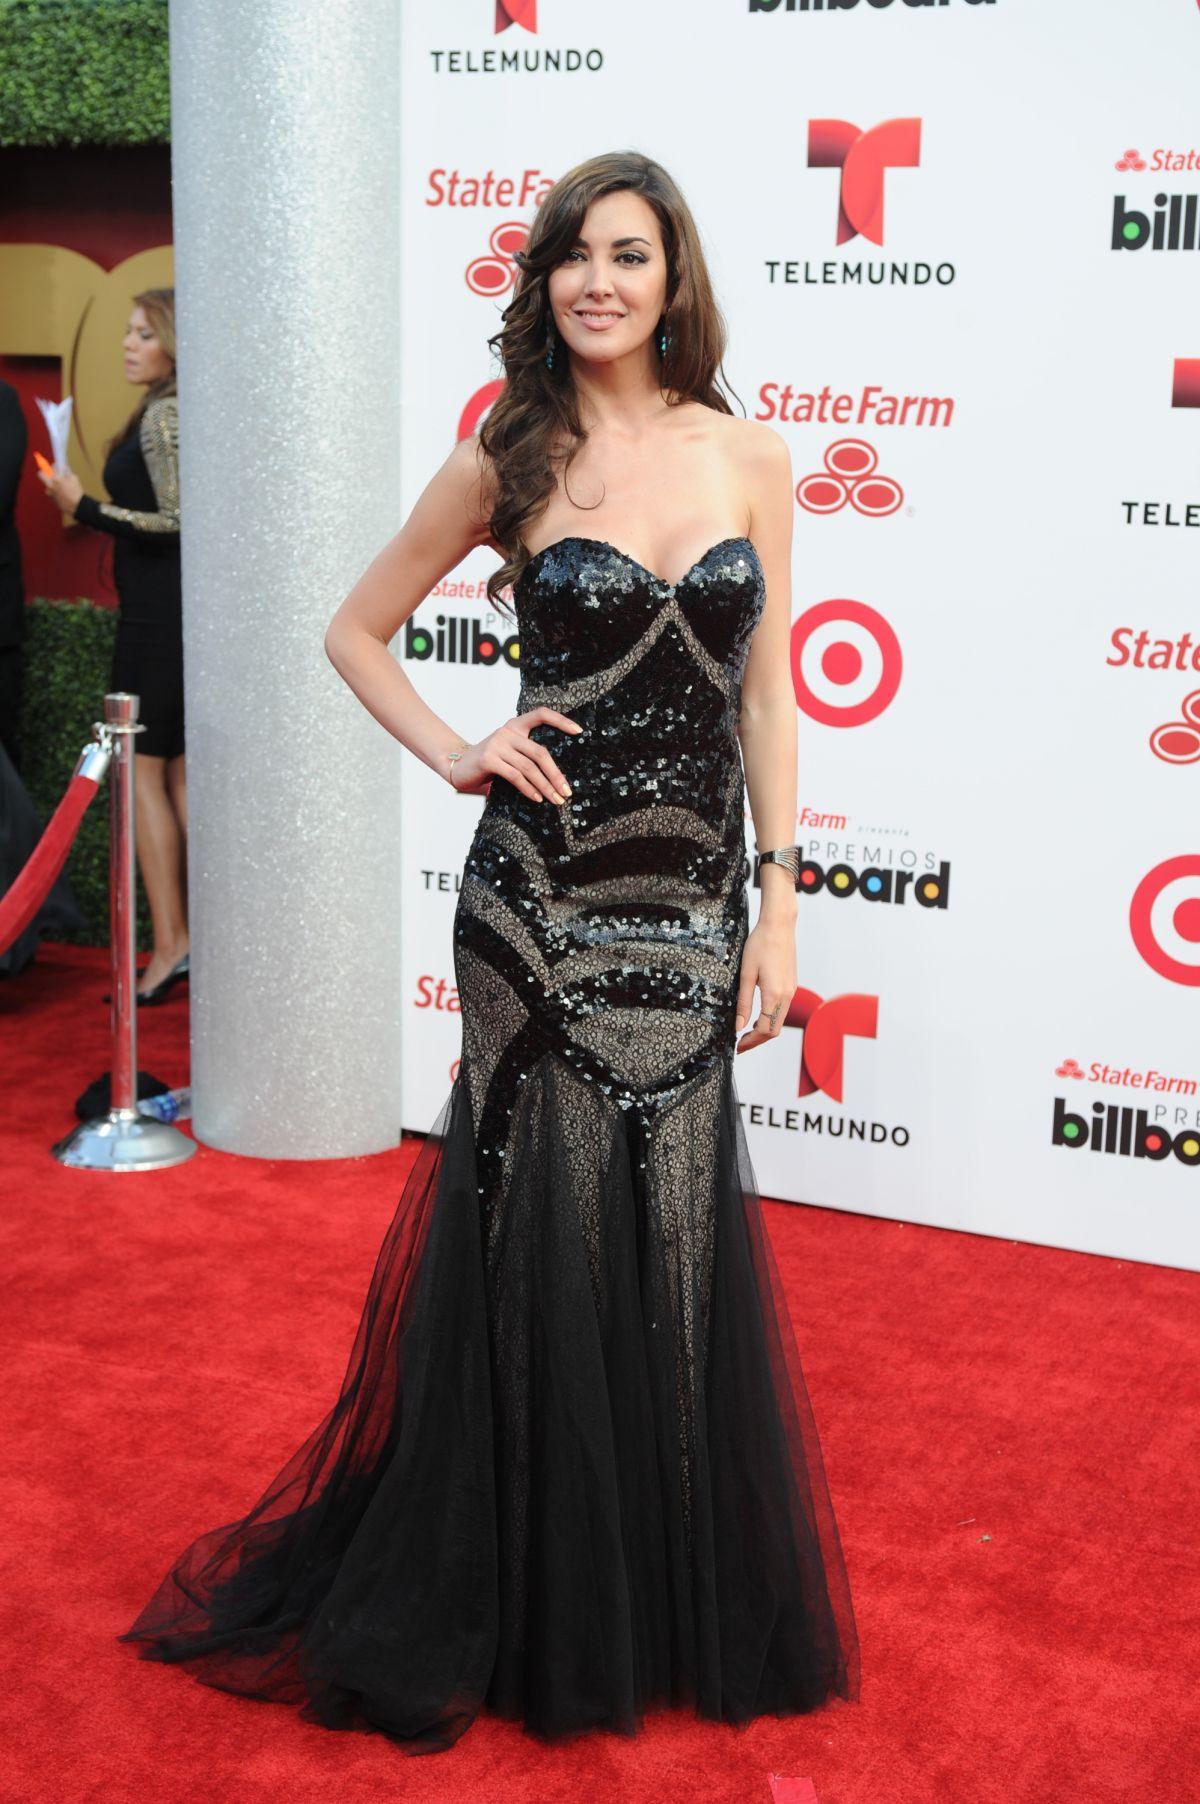 PRISCILA PERALES at 2014 Billboard Latin Music Awards in Miami